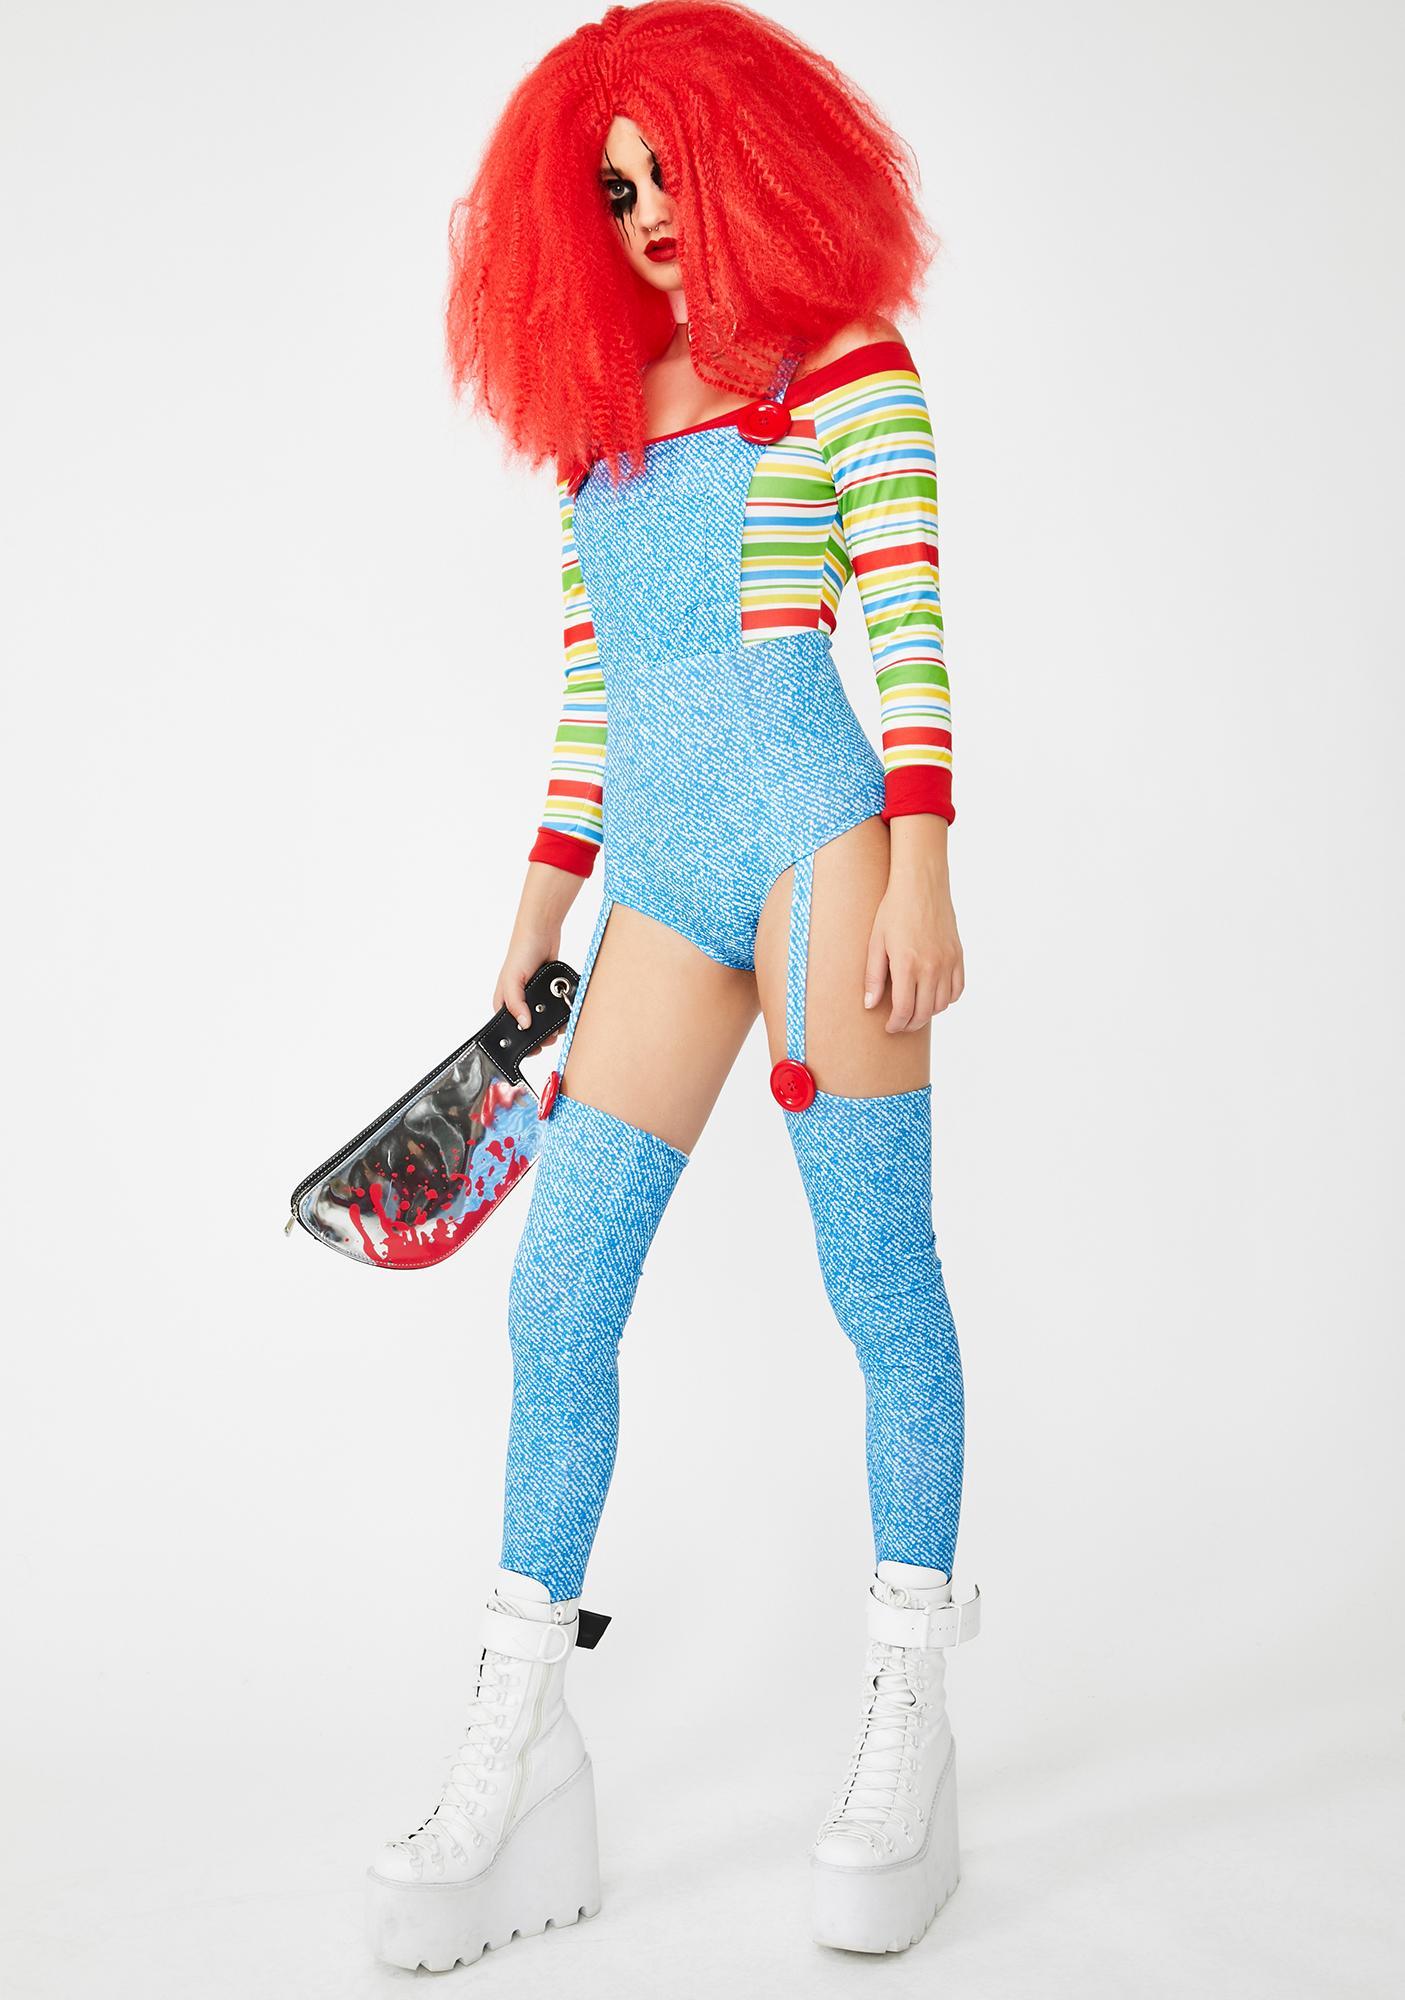 Kid Killer Doll Costume